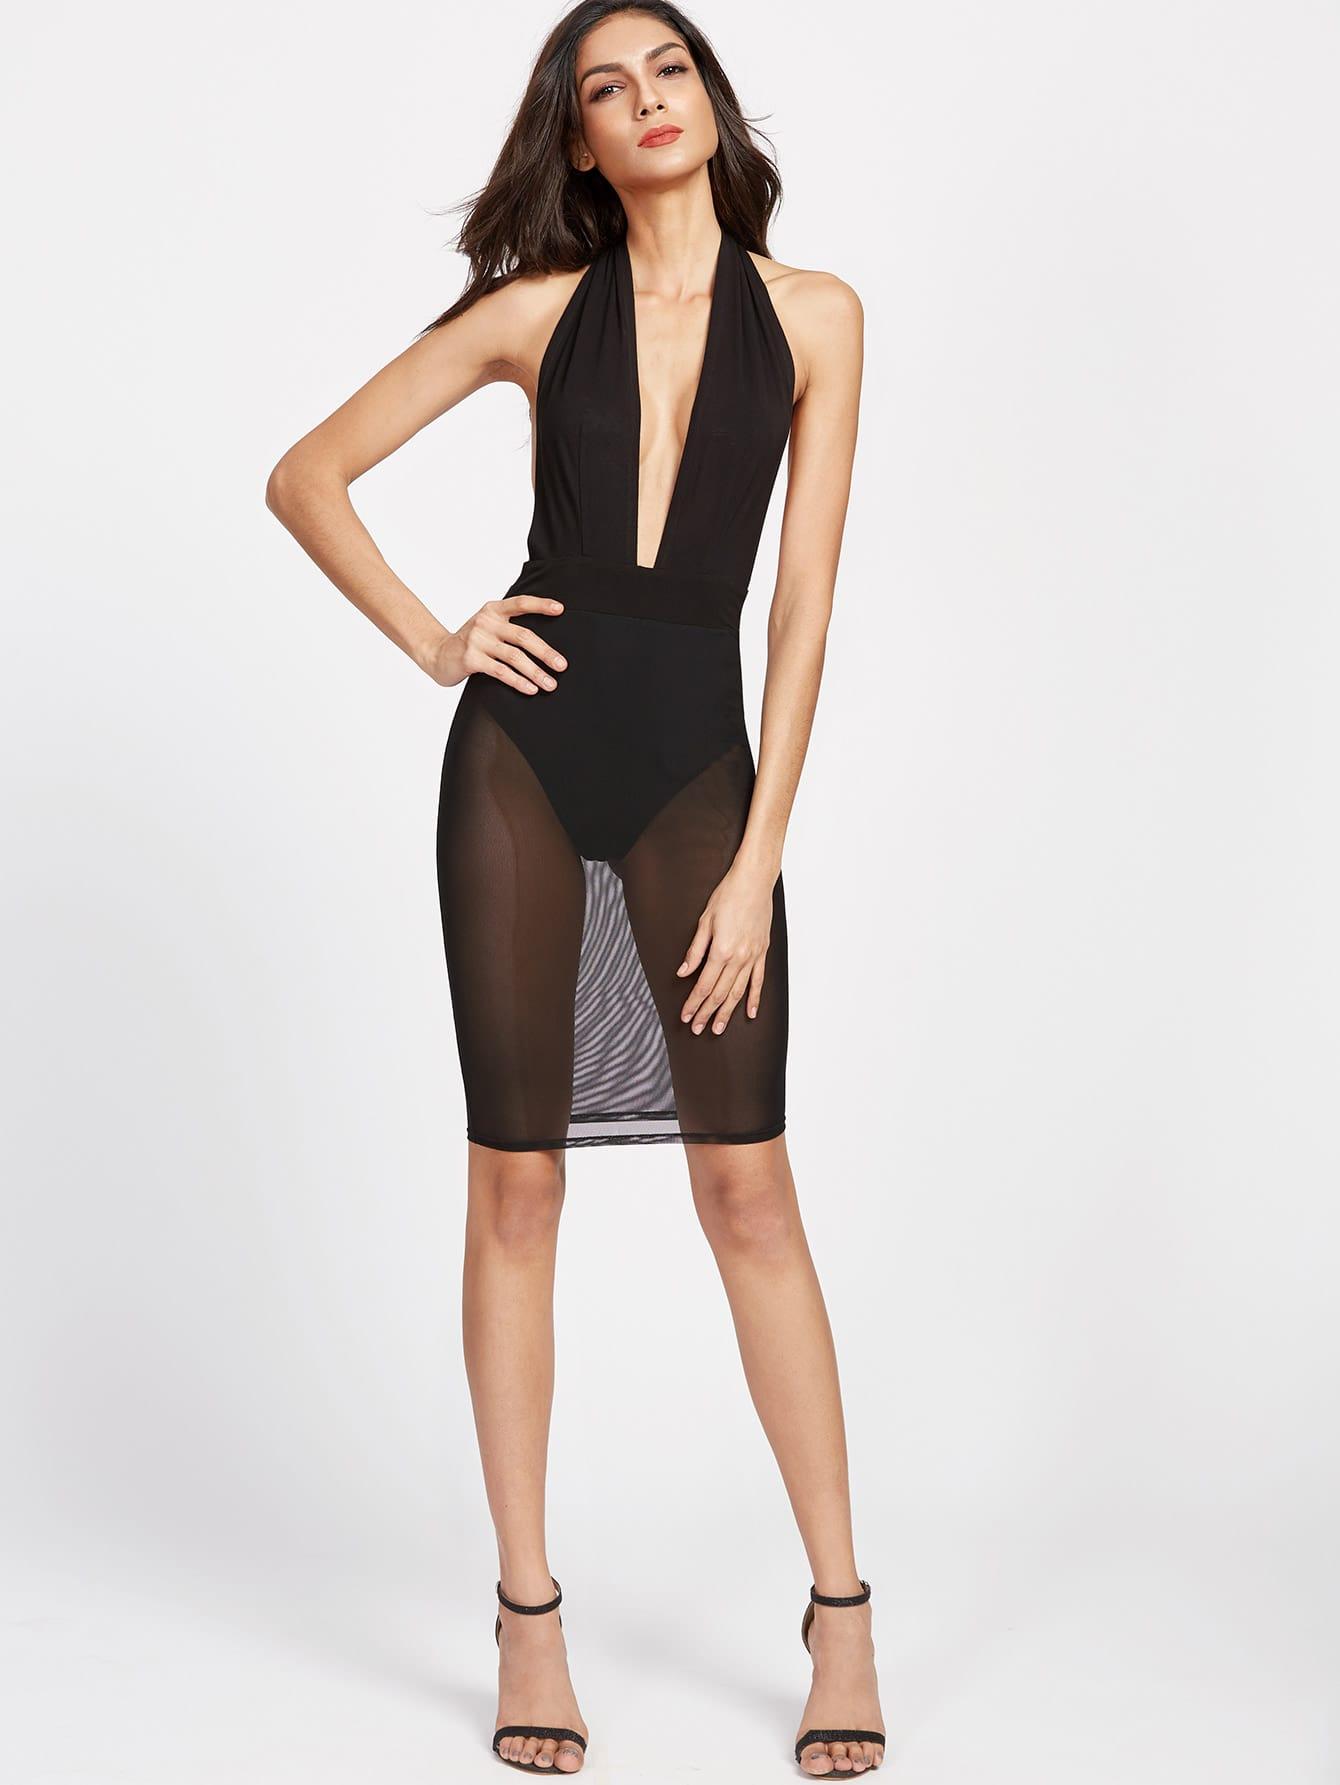 Plunge Halter Neck Backless Mesh Bodysuit Dress Shein